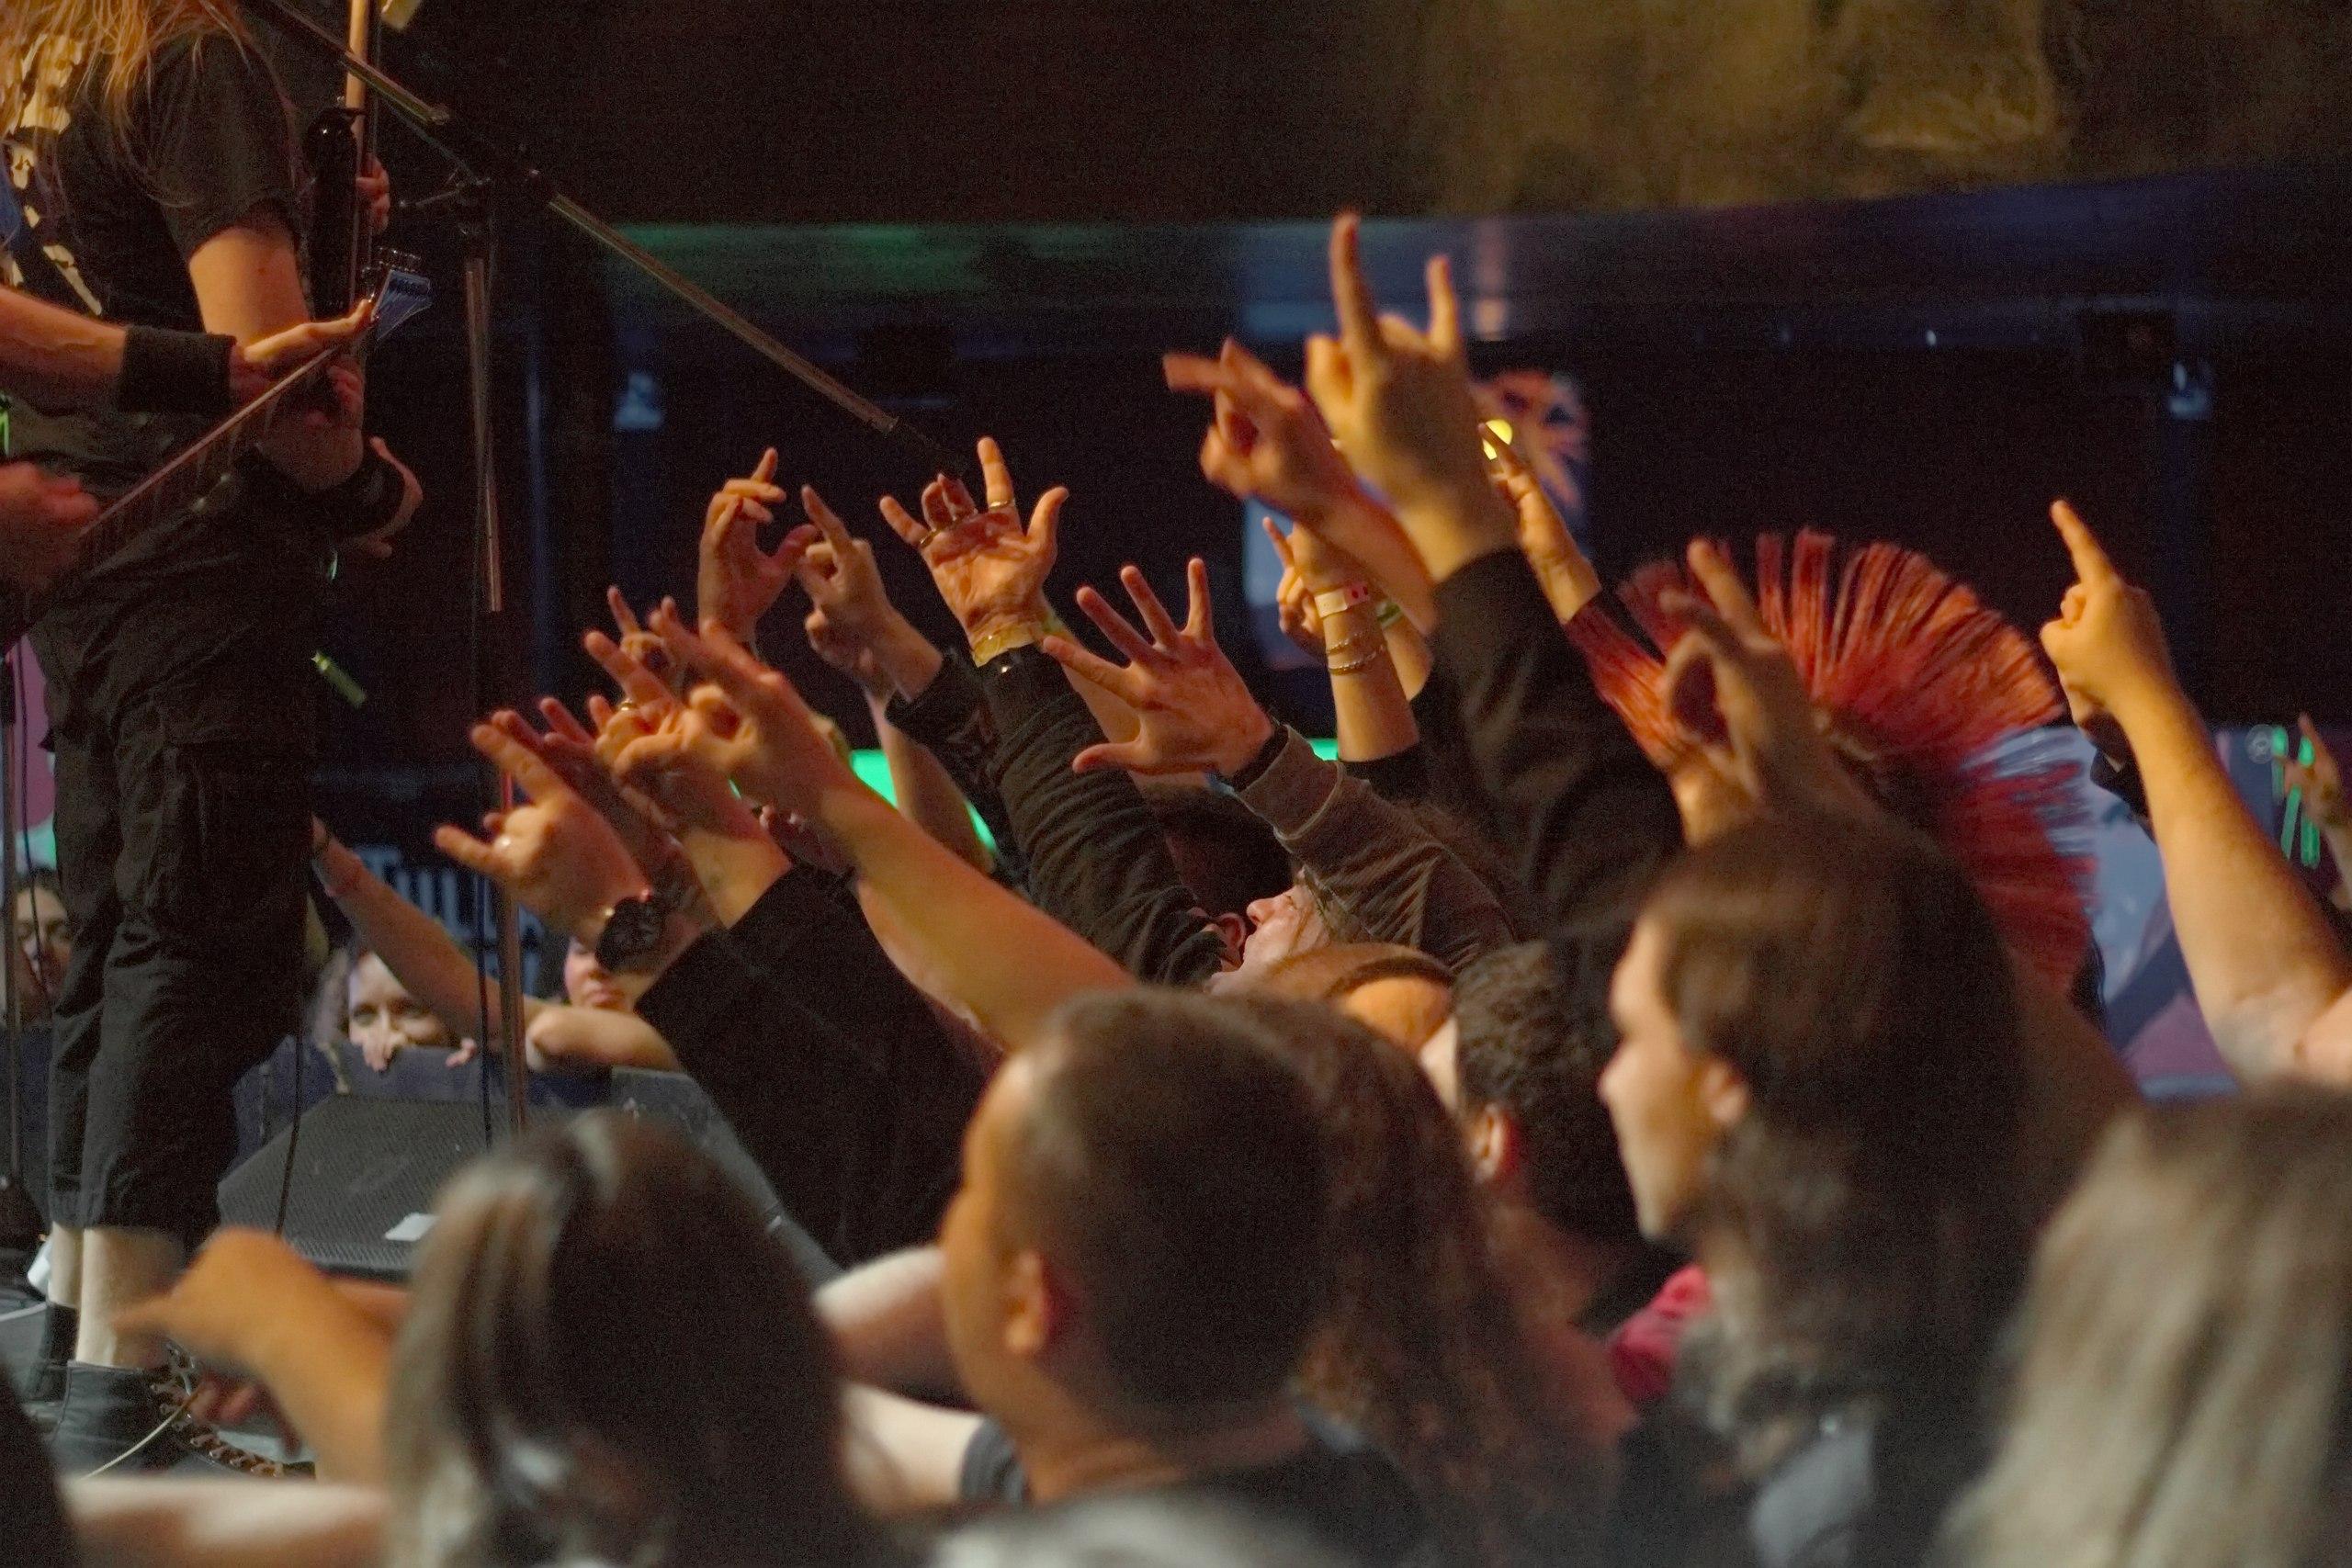 FREEDOM METAL FESTIVAL